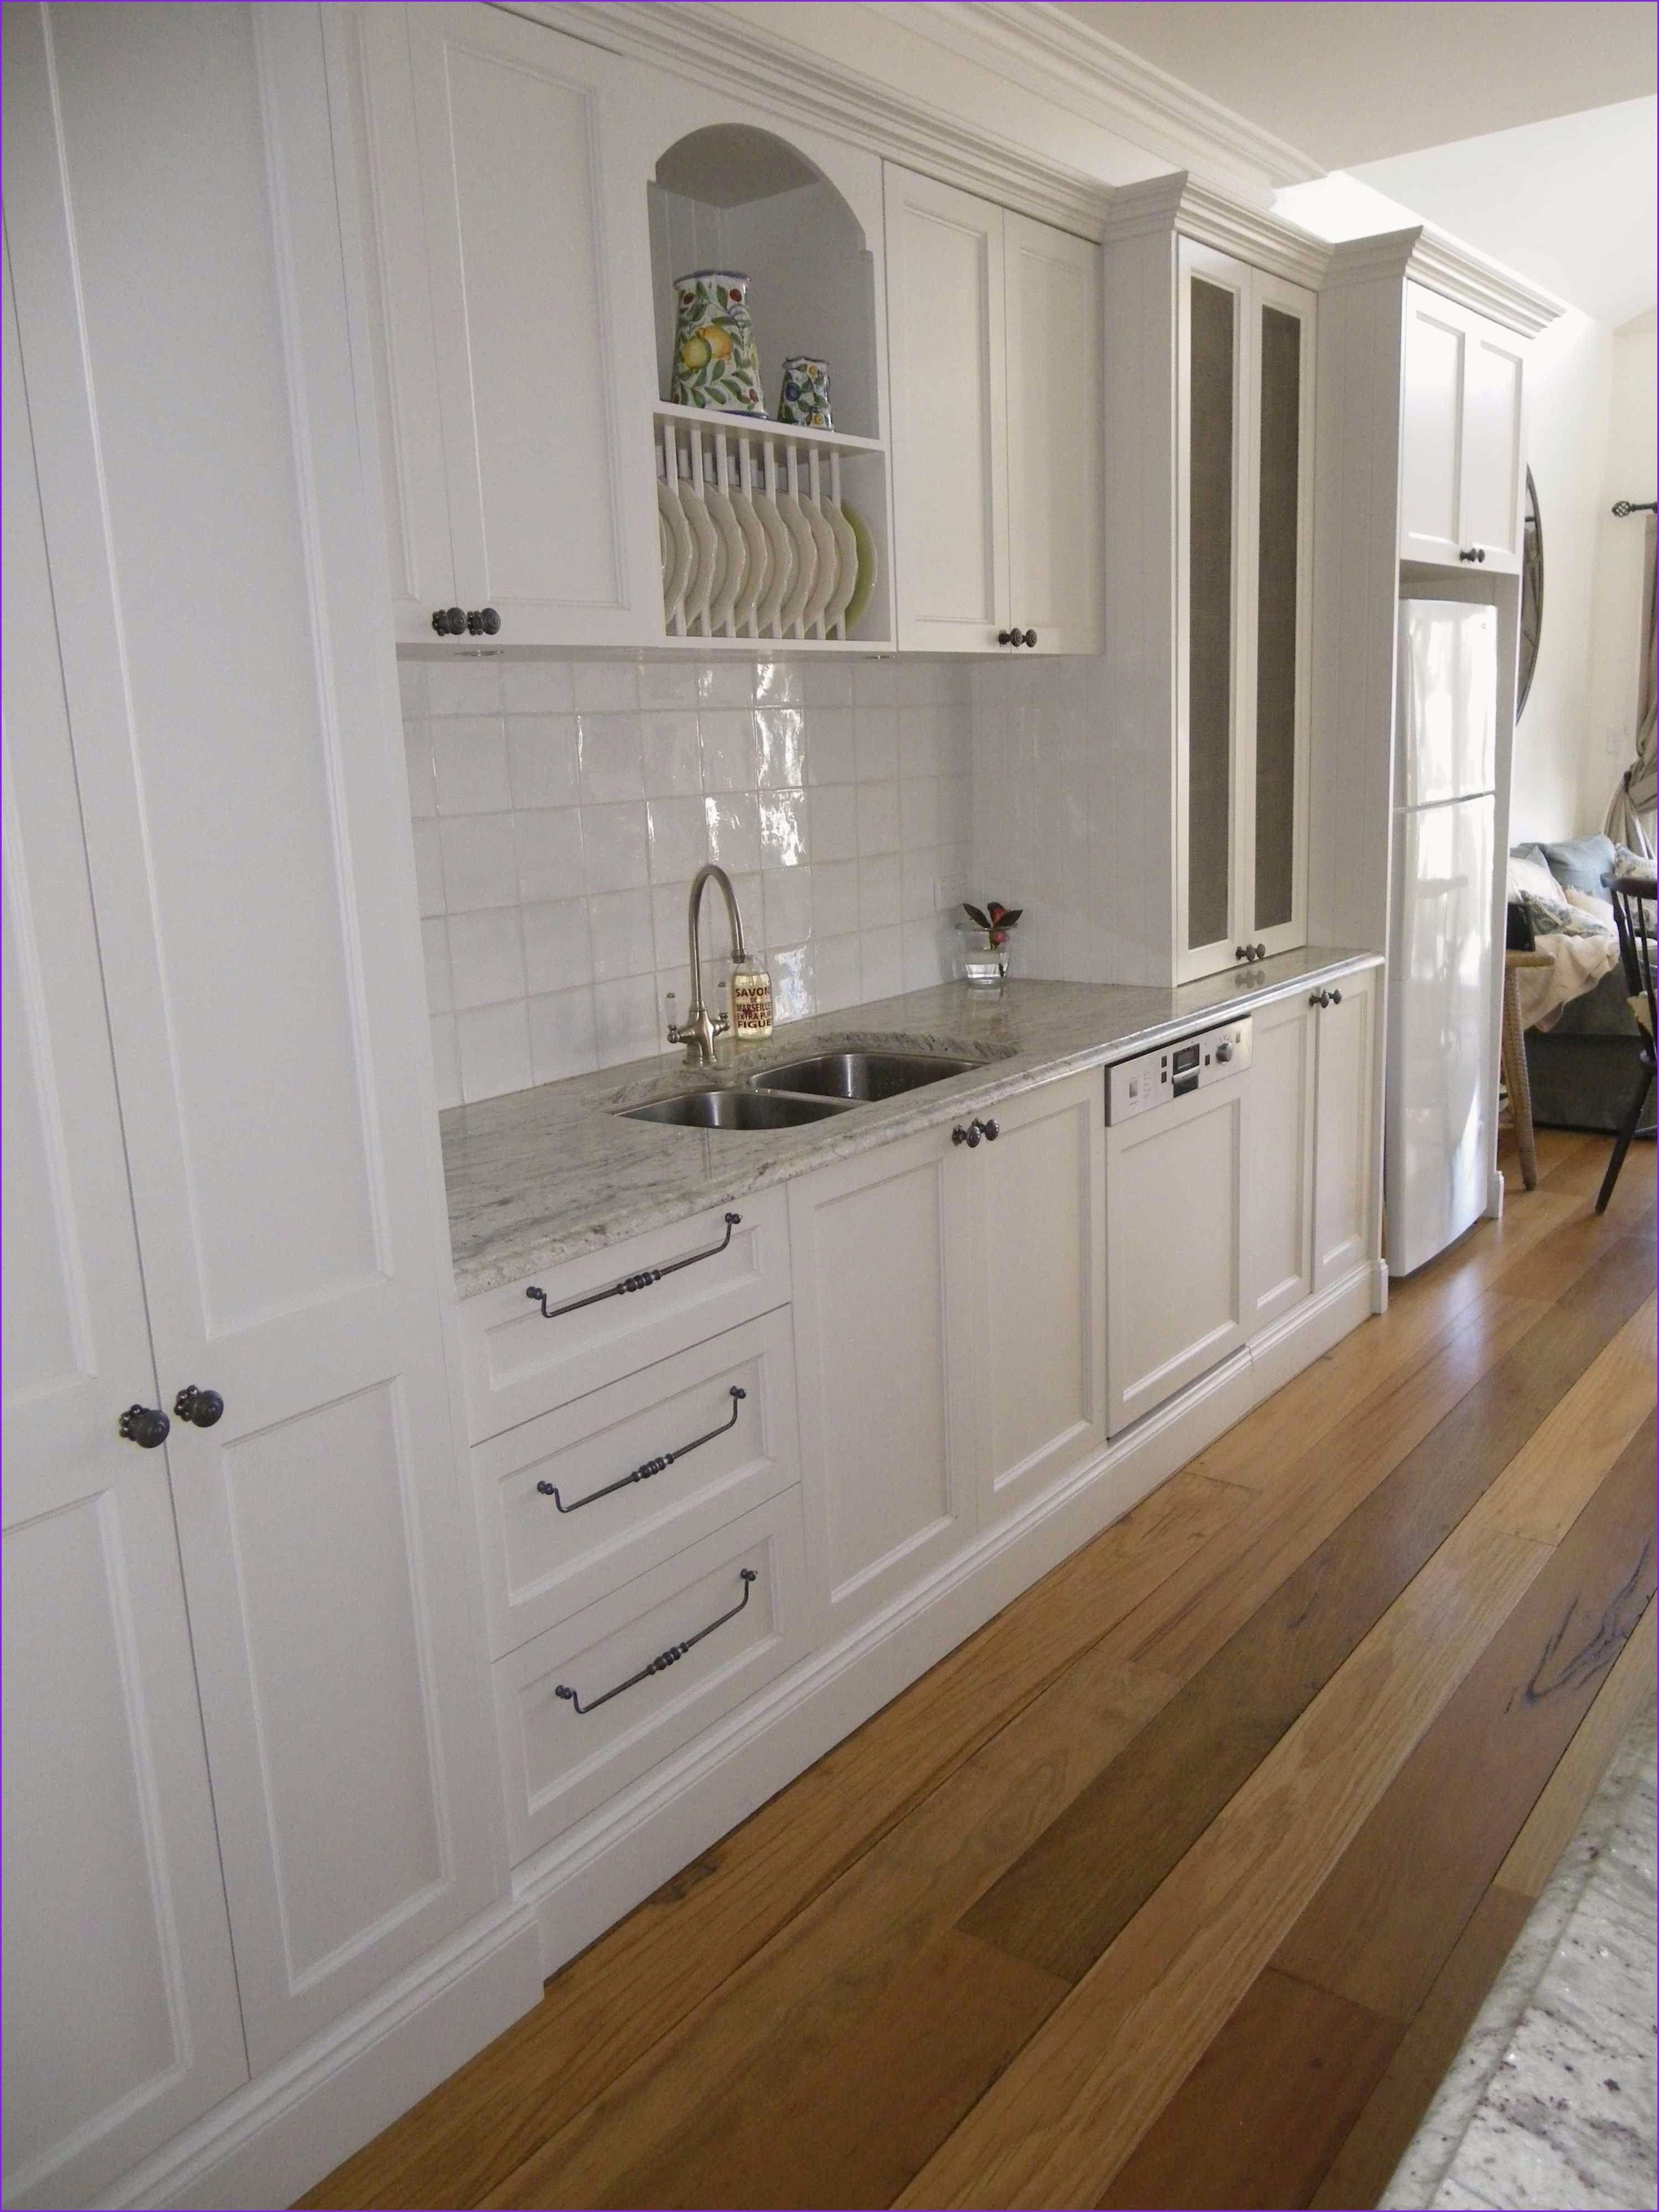 Awesome Bassett Furniture Tulsa Laminate Kitchen Cabinets Laminate Kitchen Kitchen Cabinets